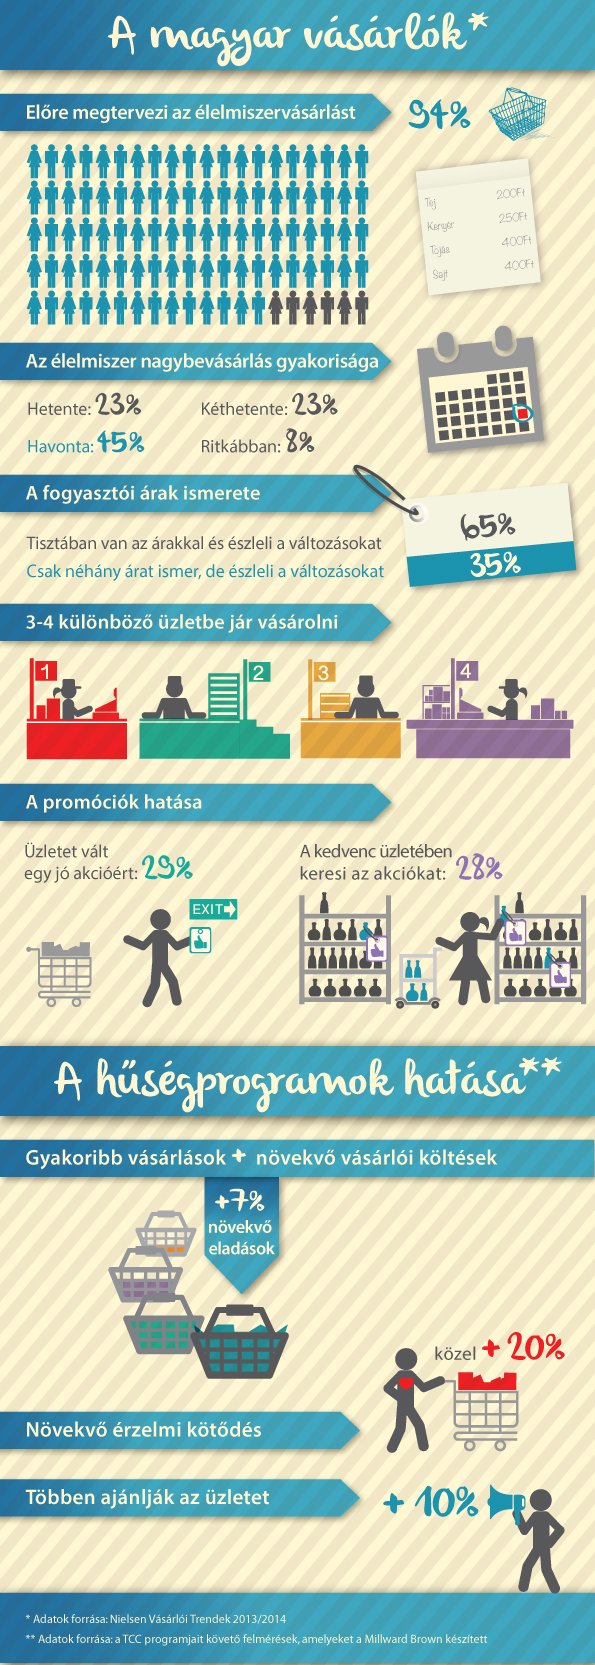 A_magyar_vasarlok_infografika_141006.jpg